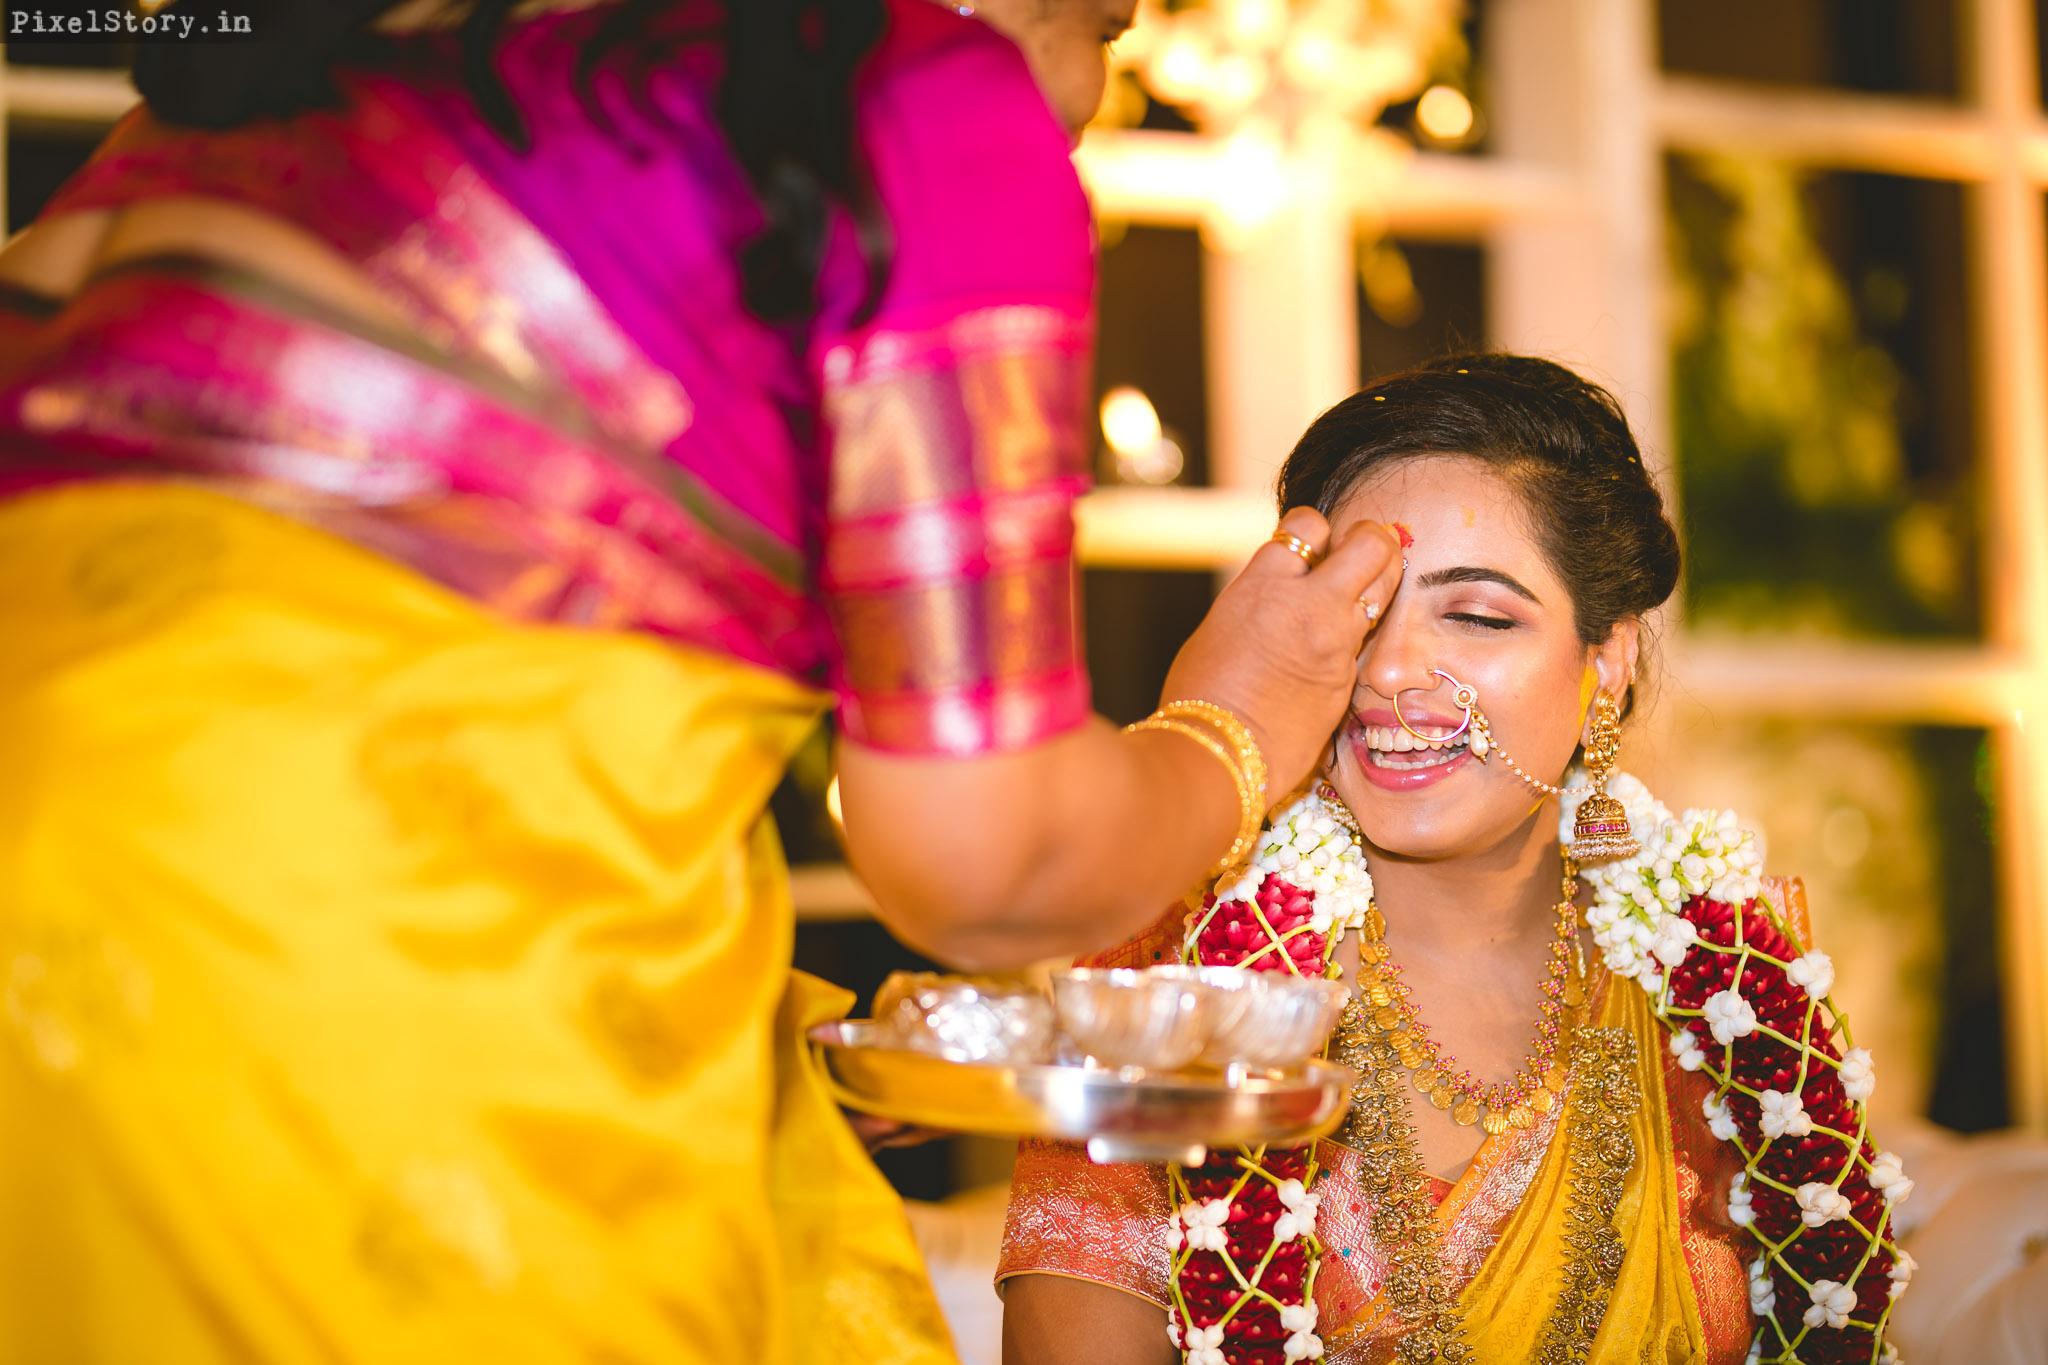 PixelStory-Engagement-Ritz-Carlton-Preksha-Bharath-010.jpg